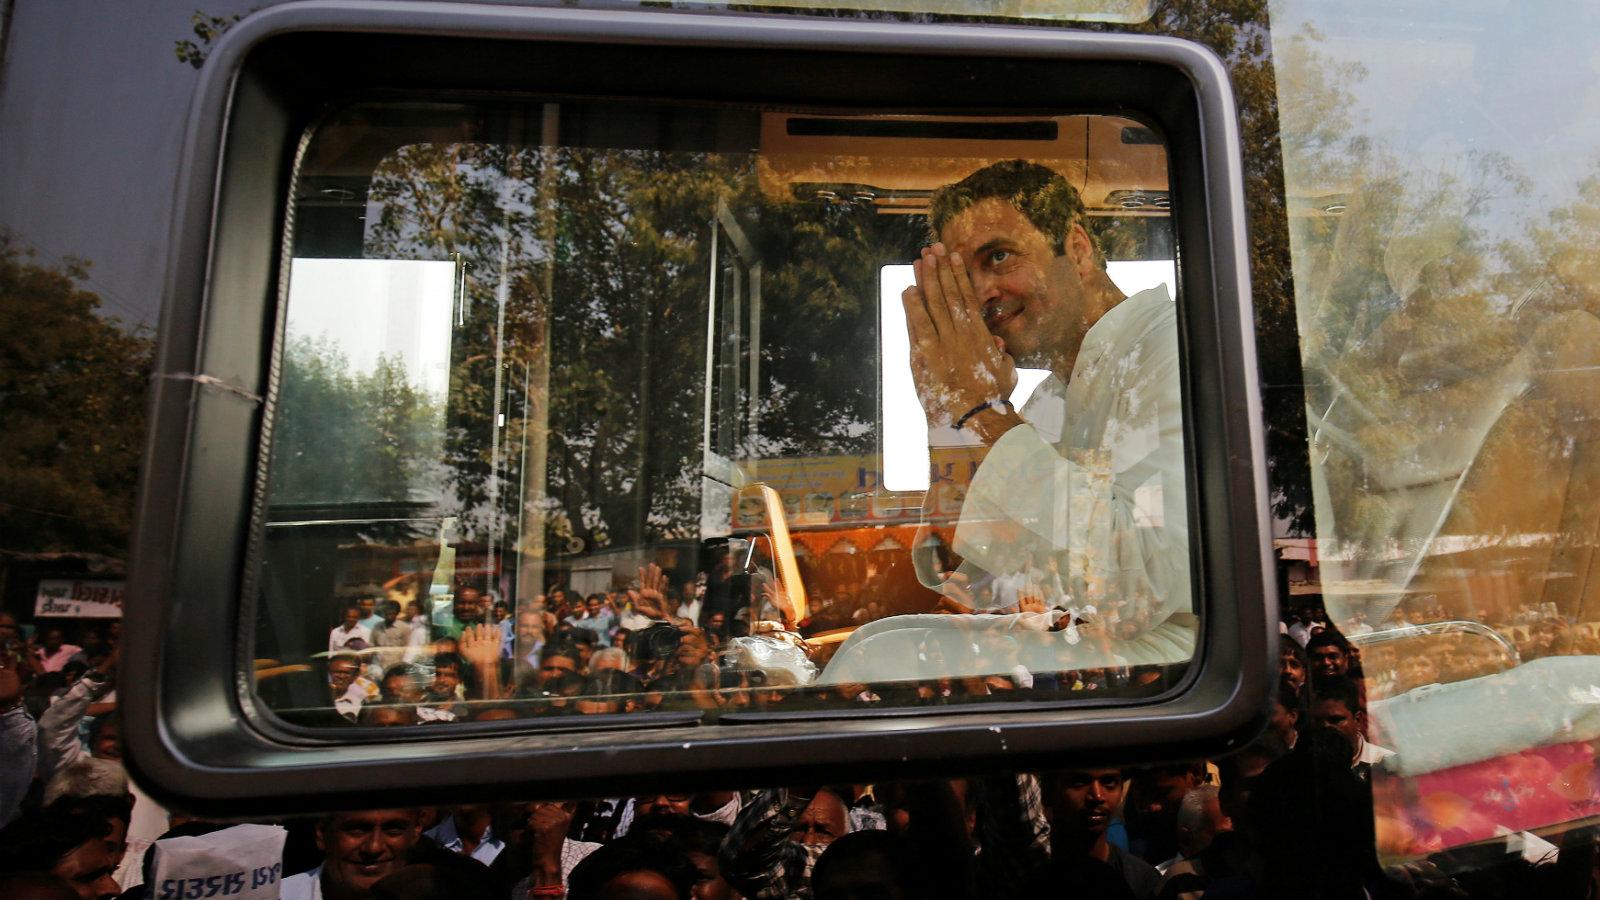 Rahul Gandhi greets his supporters at a village outside Ahmedabad, Gujarat, on Nov. 11, 2017.